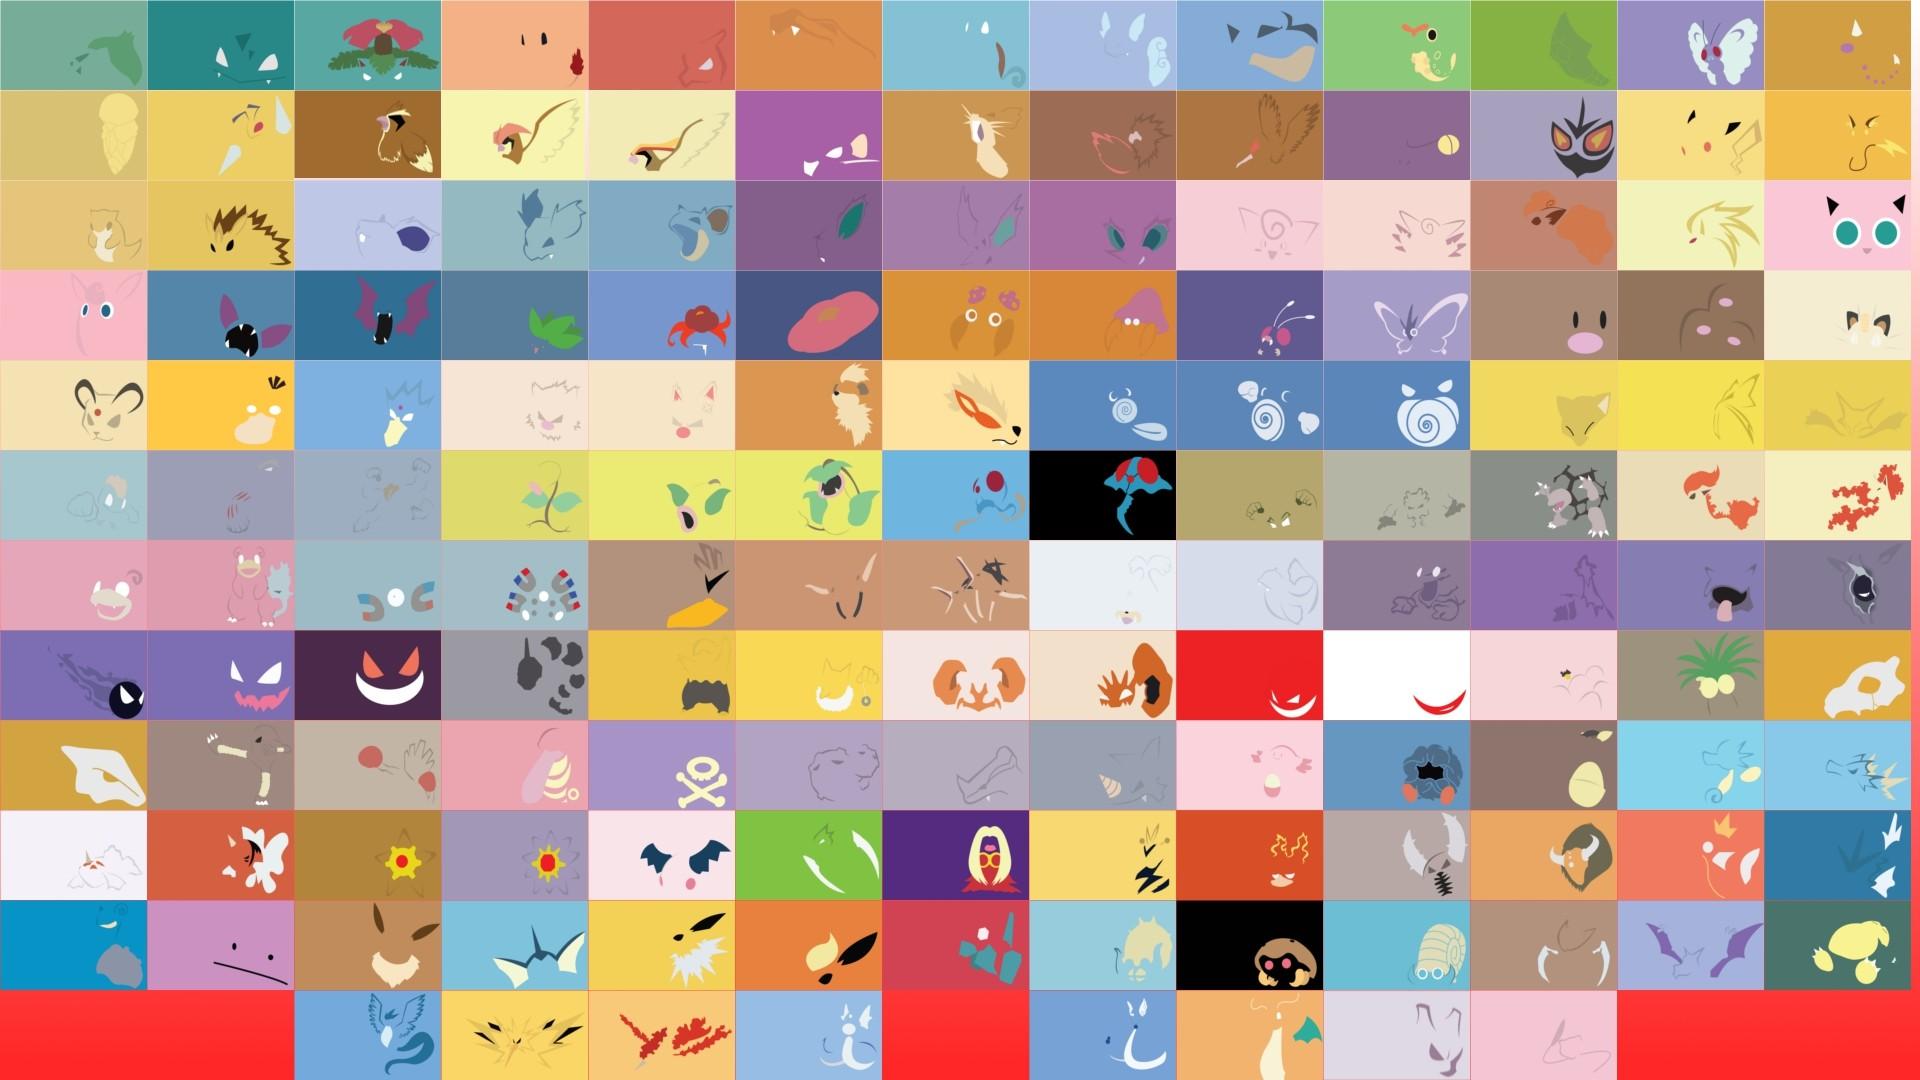 Pokemon Wallpaper Backgrounds #9249 Wallpaper | Cool Walldiskpaper.com